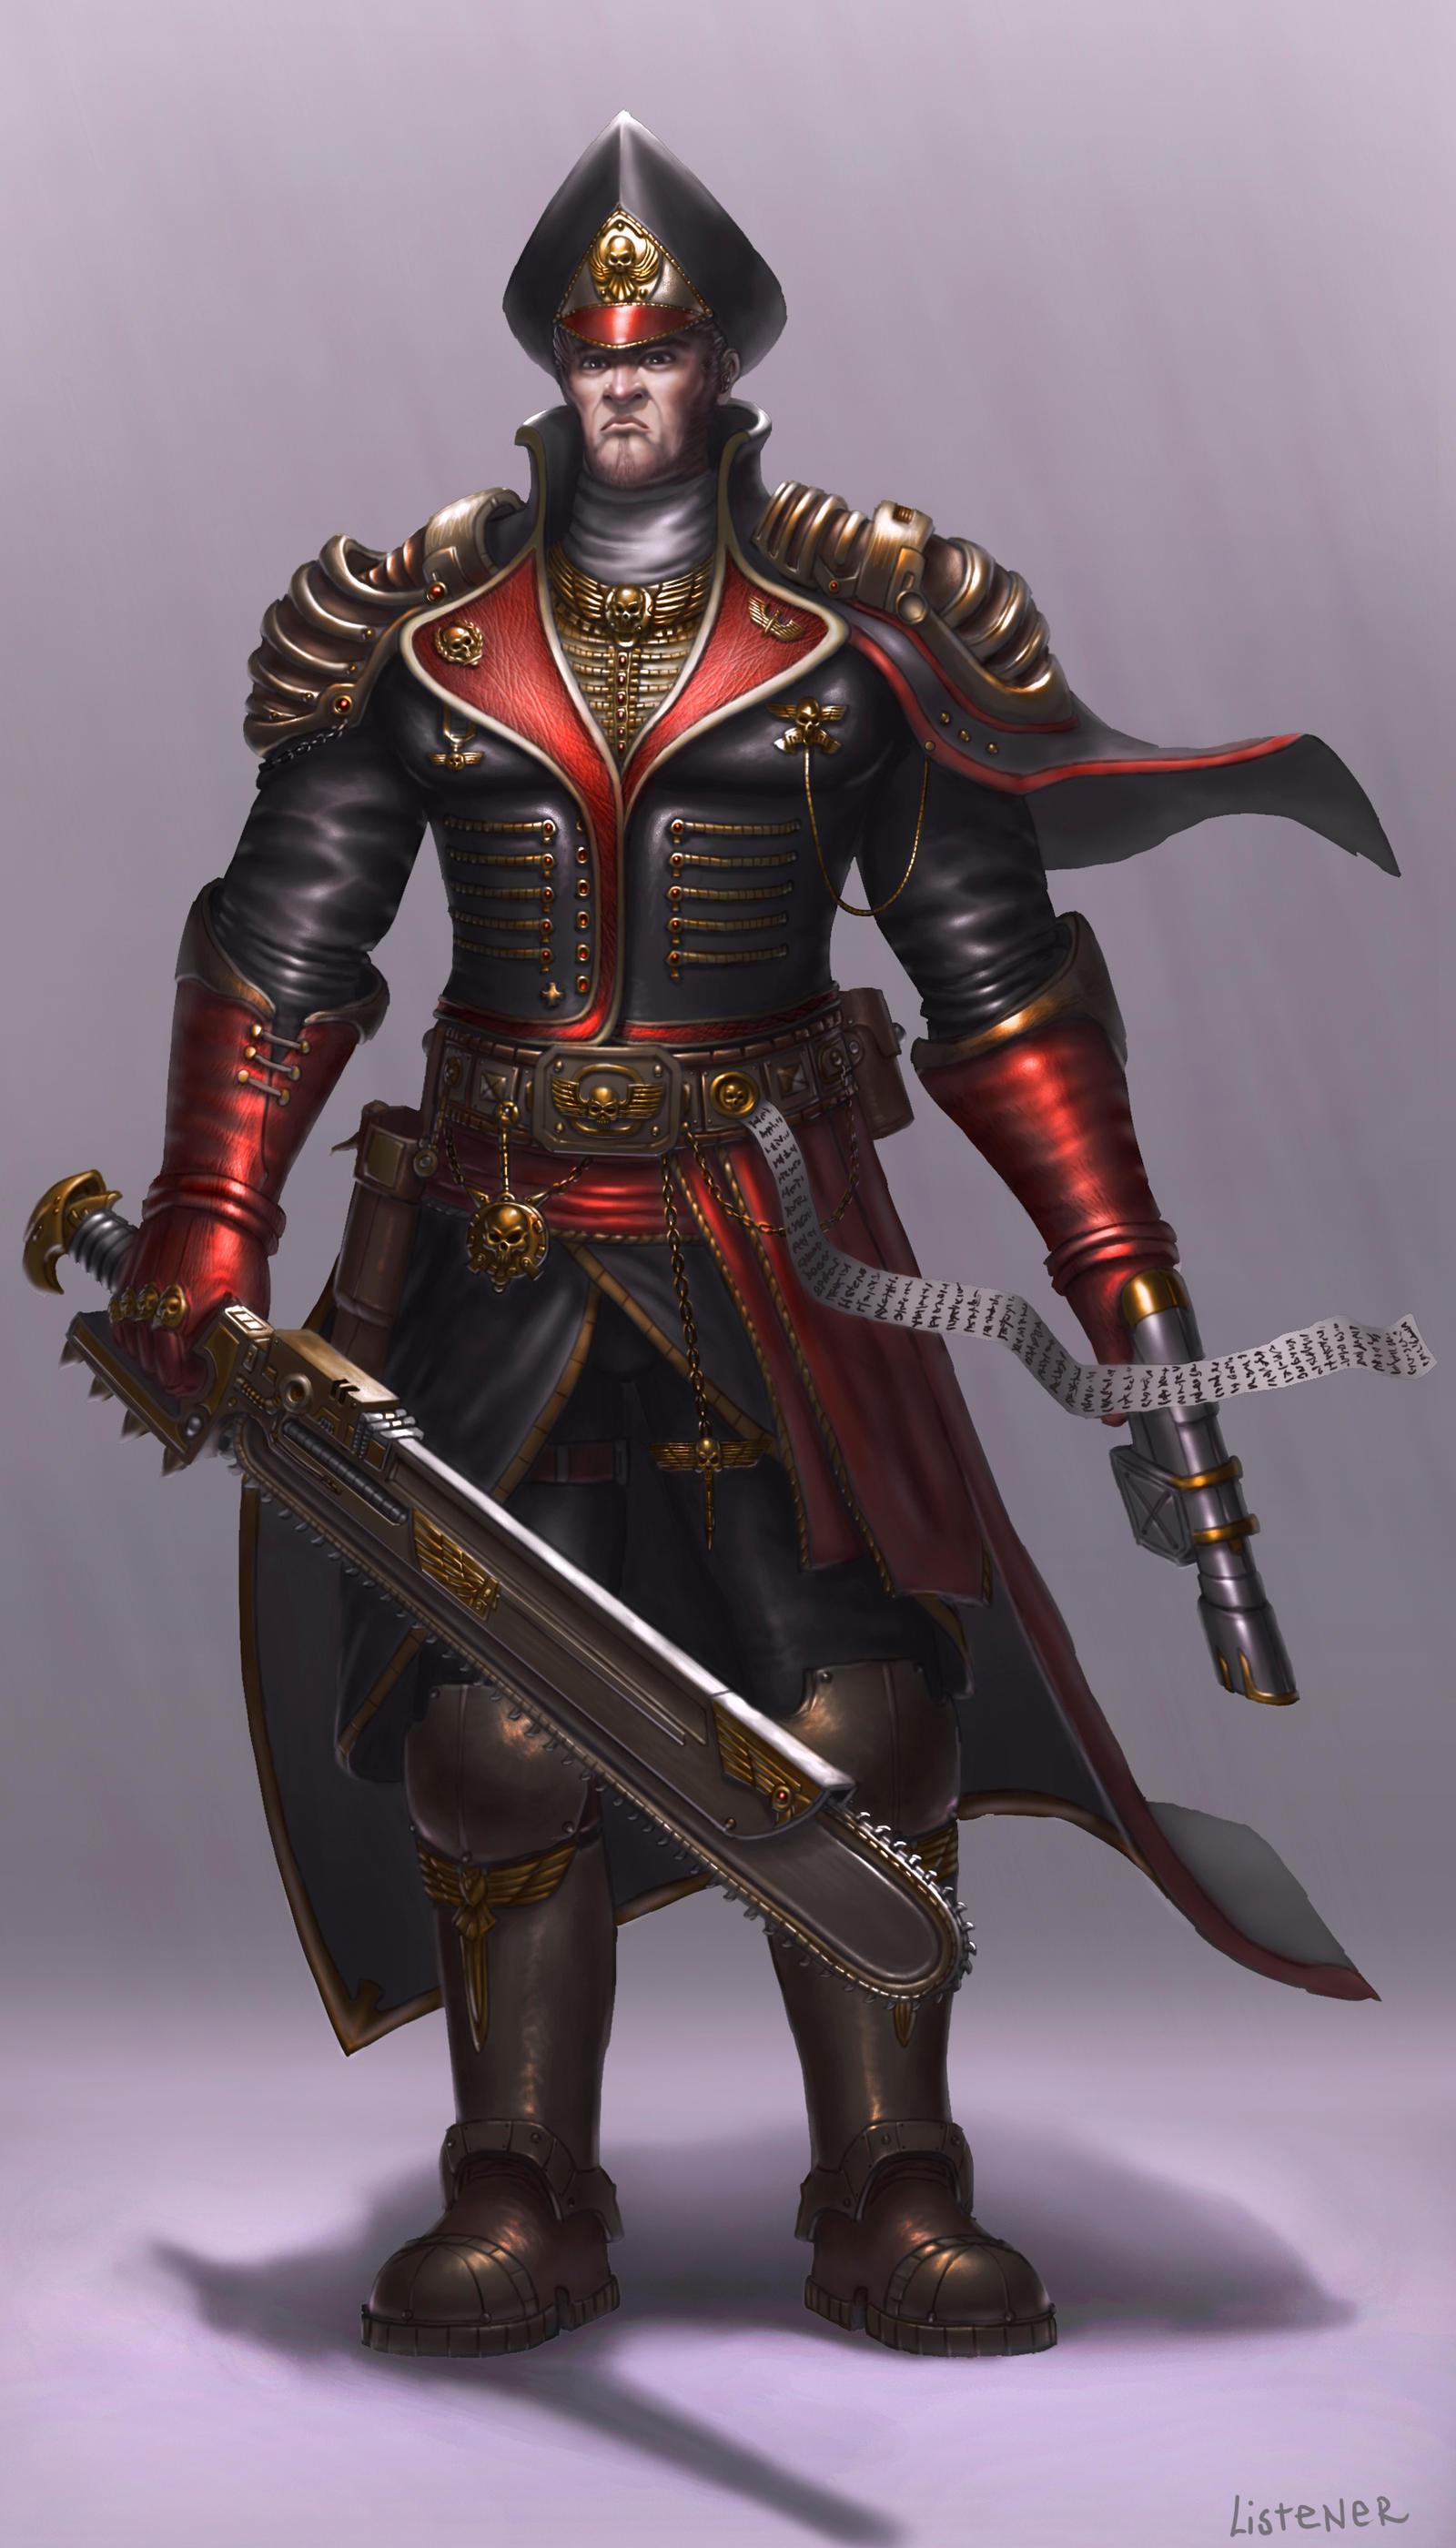 [W40K] Collection d'images : La Garde Impériale - Page 2 Hero_of_the_imperium_by_listenerkz-d73ronl